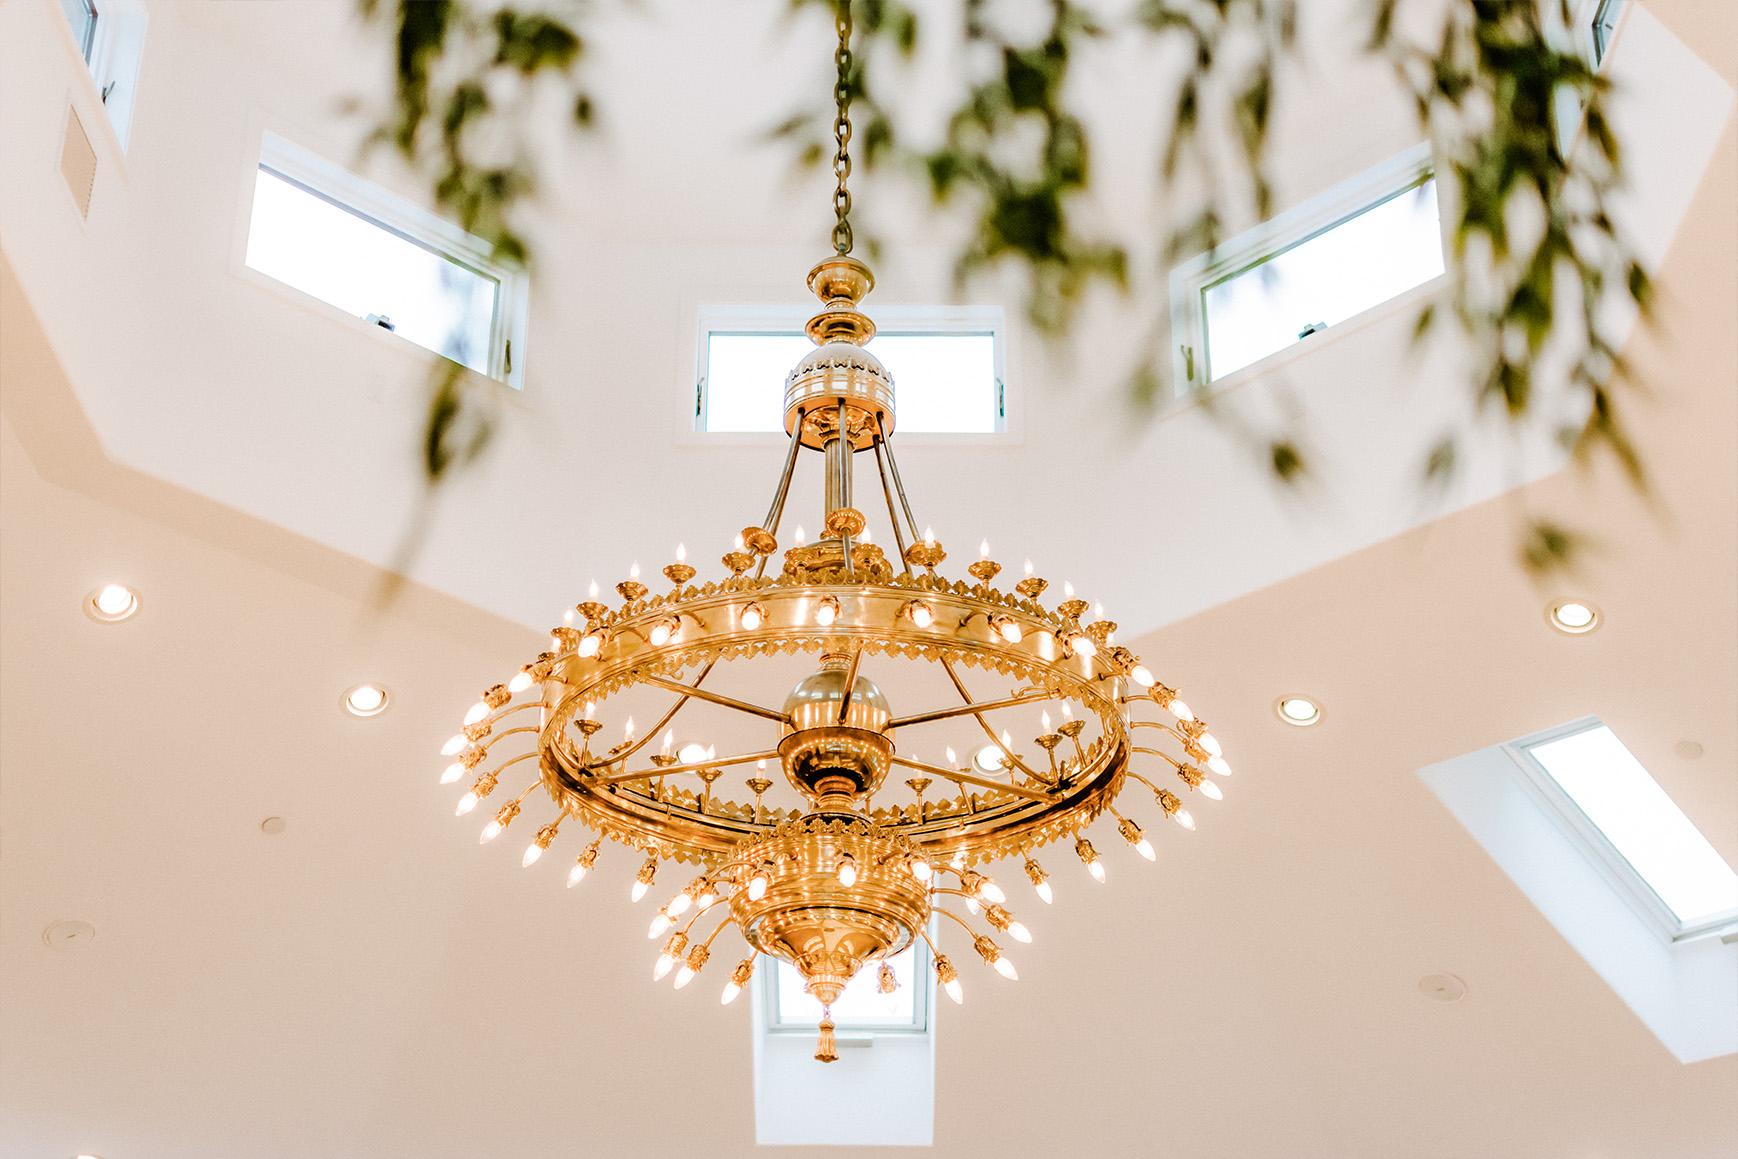 Grand Chandelier - Granite Rose - Hampstead, New Hampshire - Rockingham County - Wedgewood Weddings